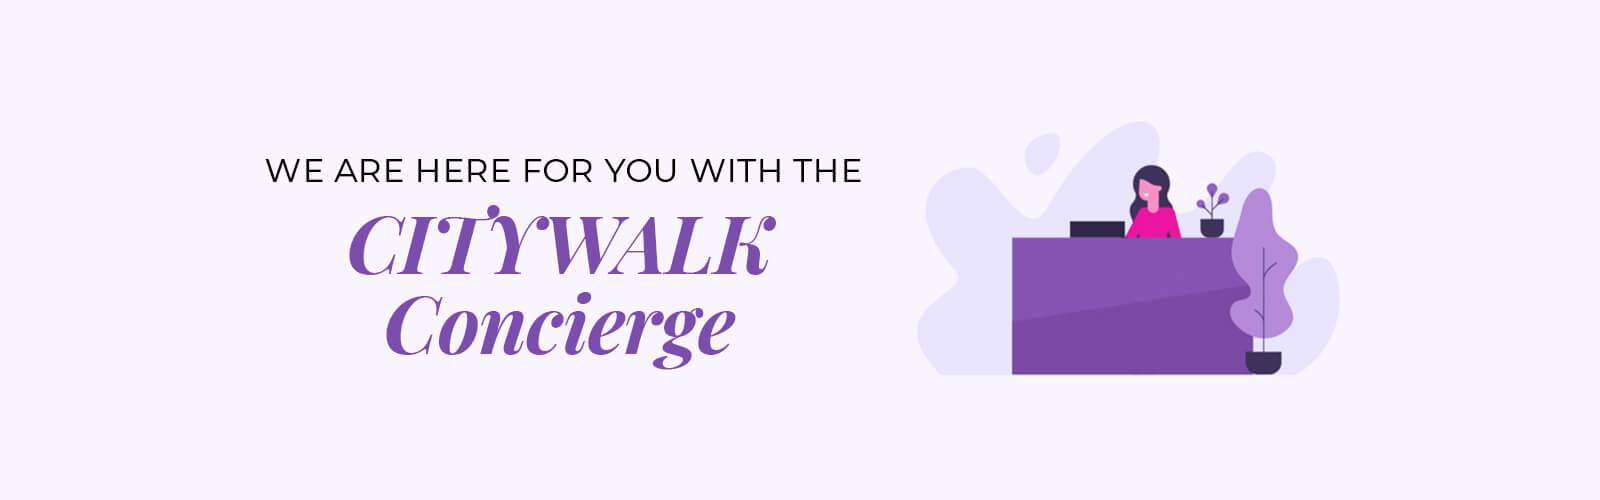 CITYWALK Concierge-desktop